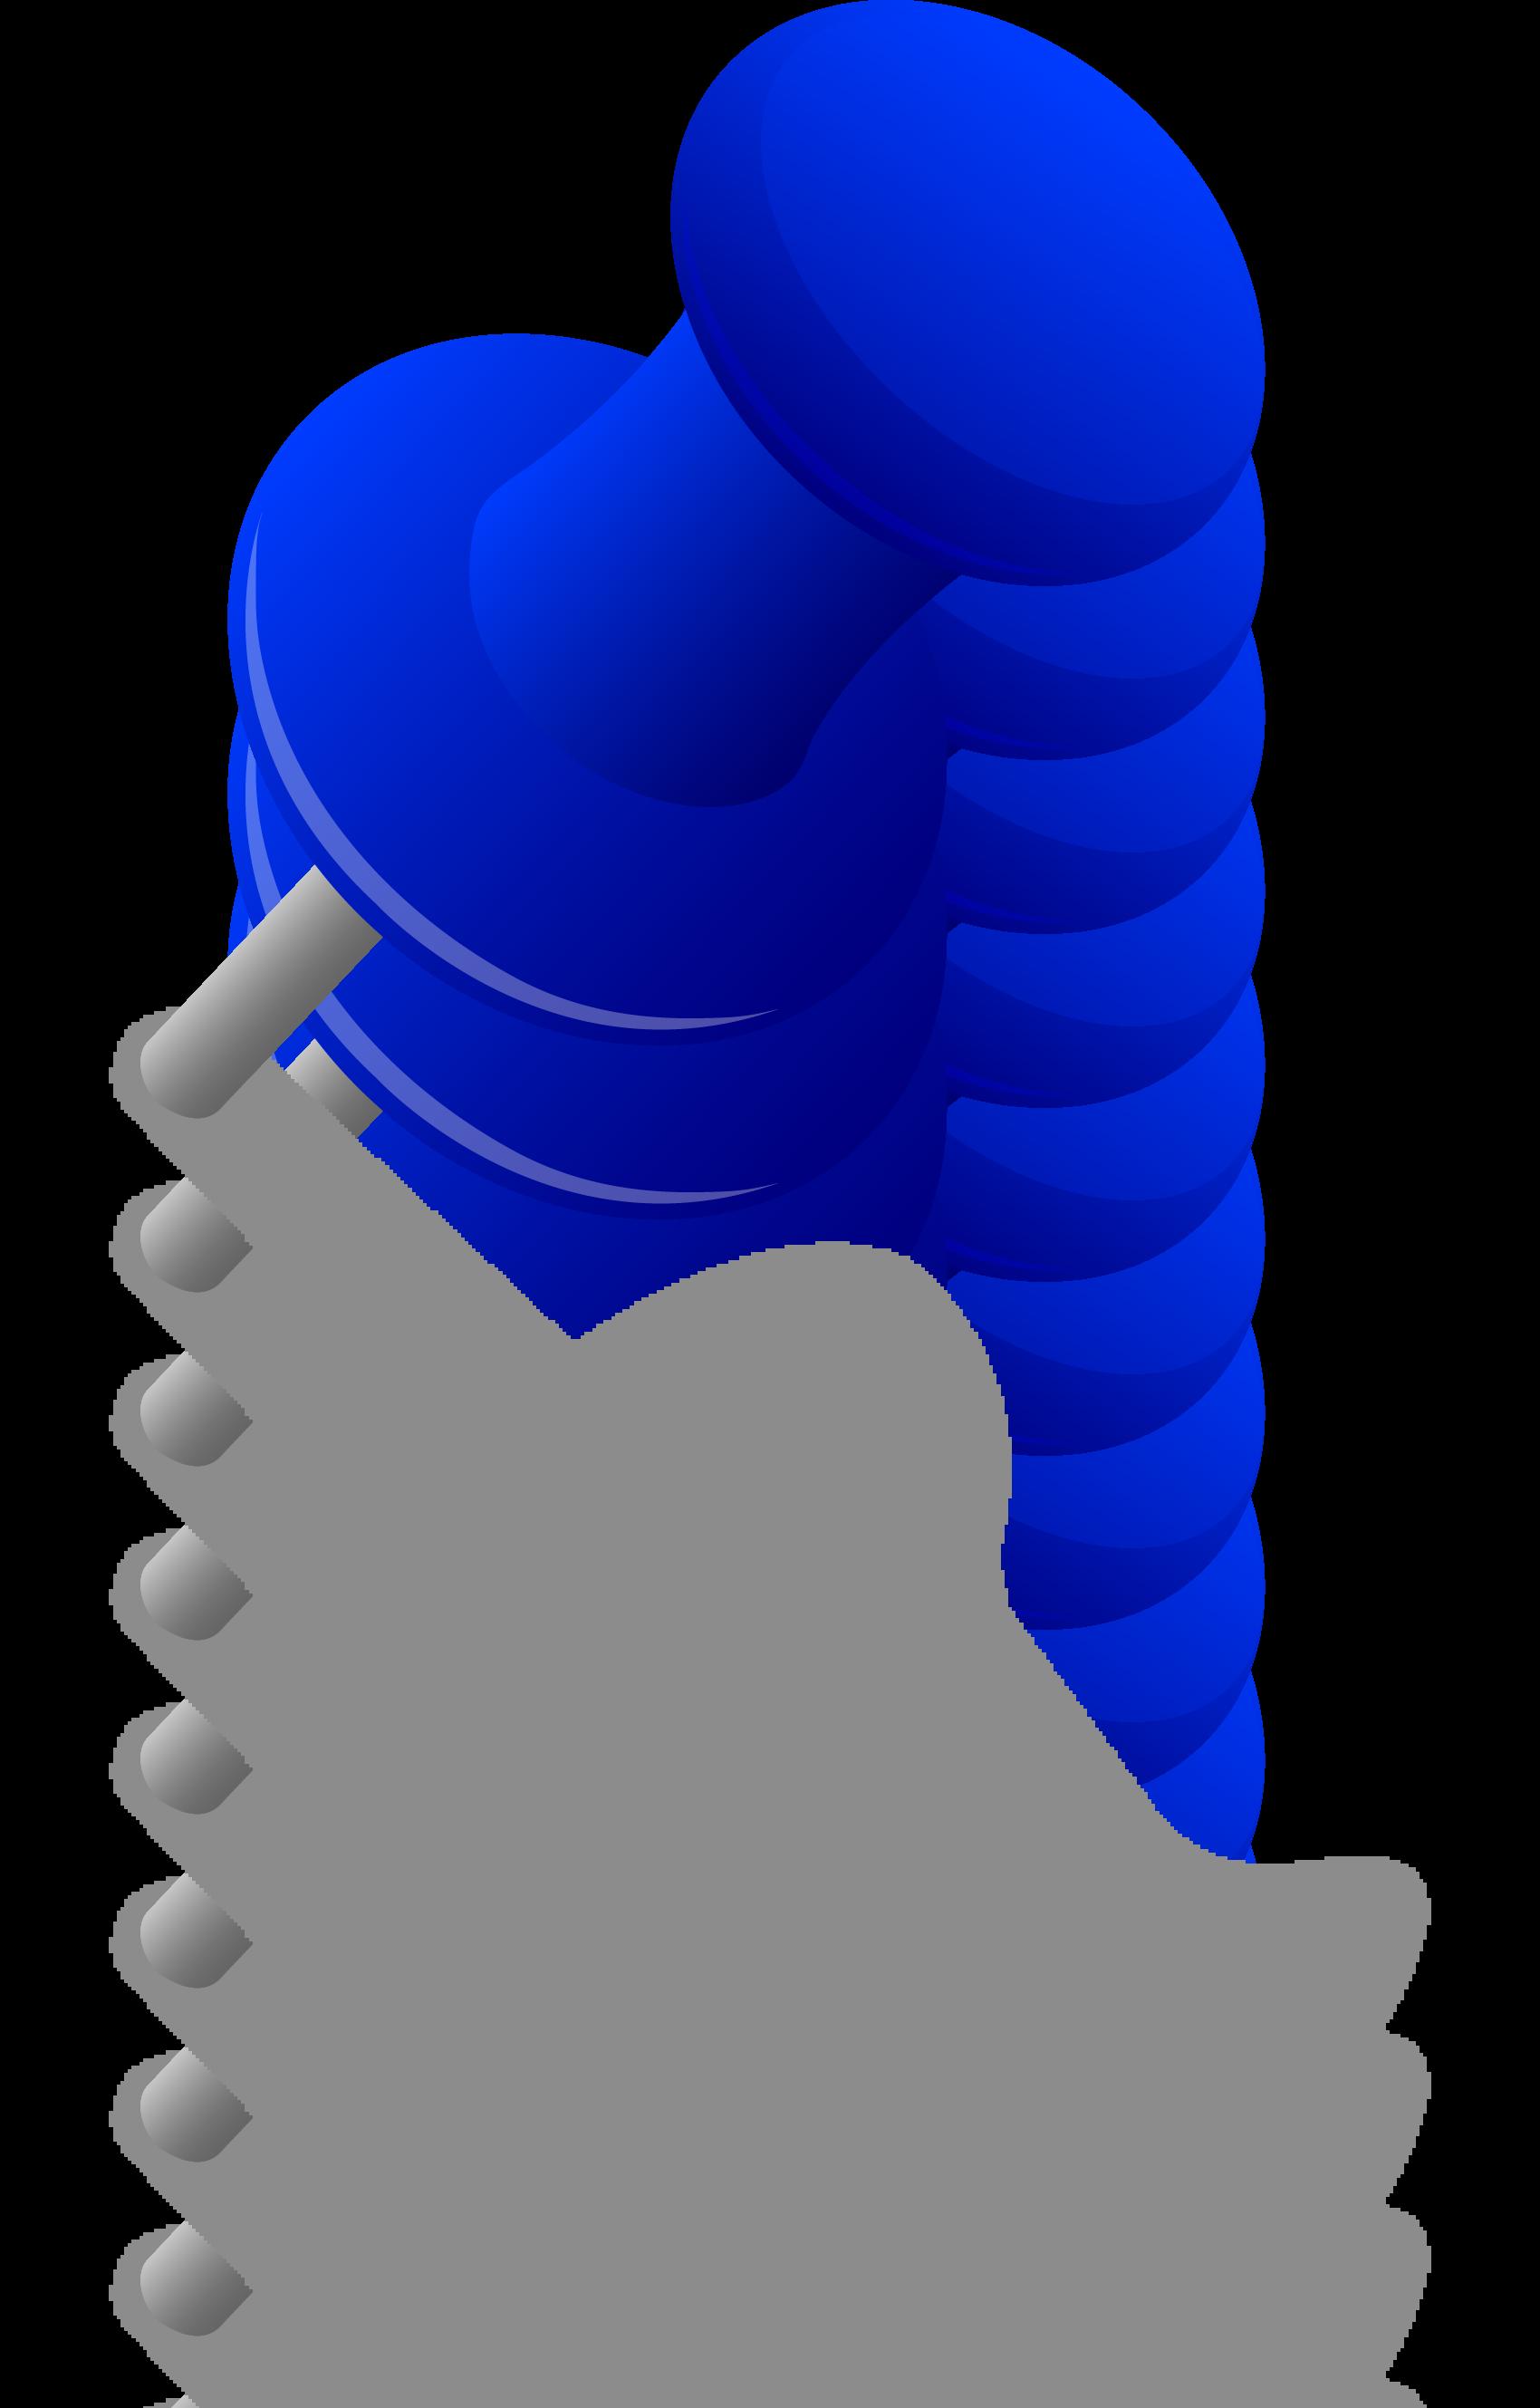 Thumb clipart sideways. Thumbtack blue in wall